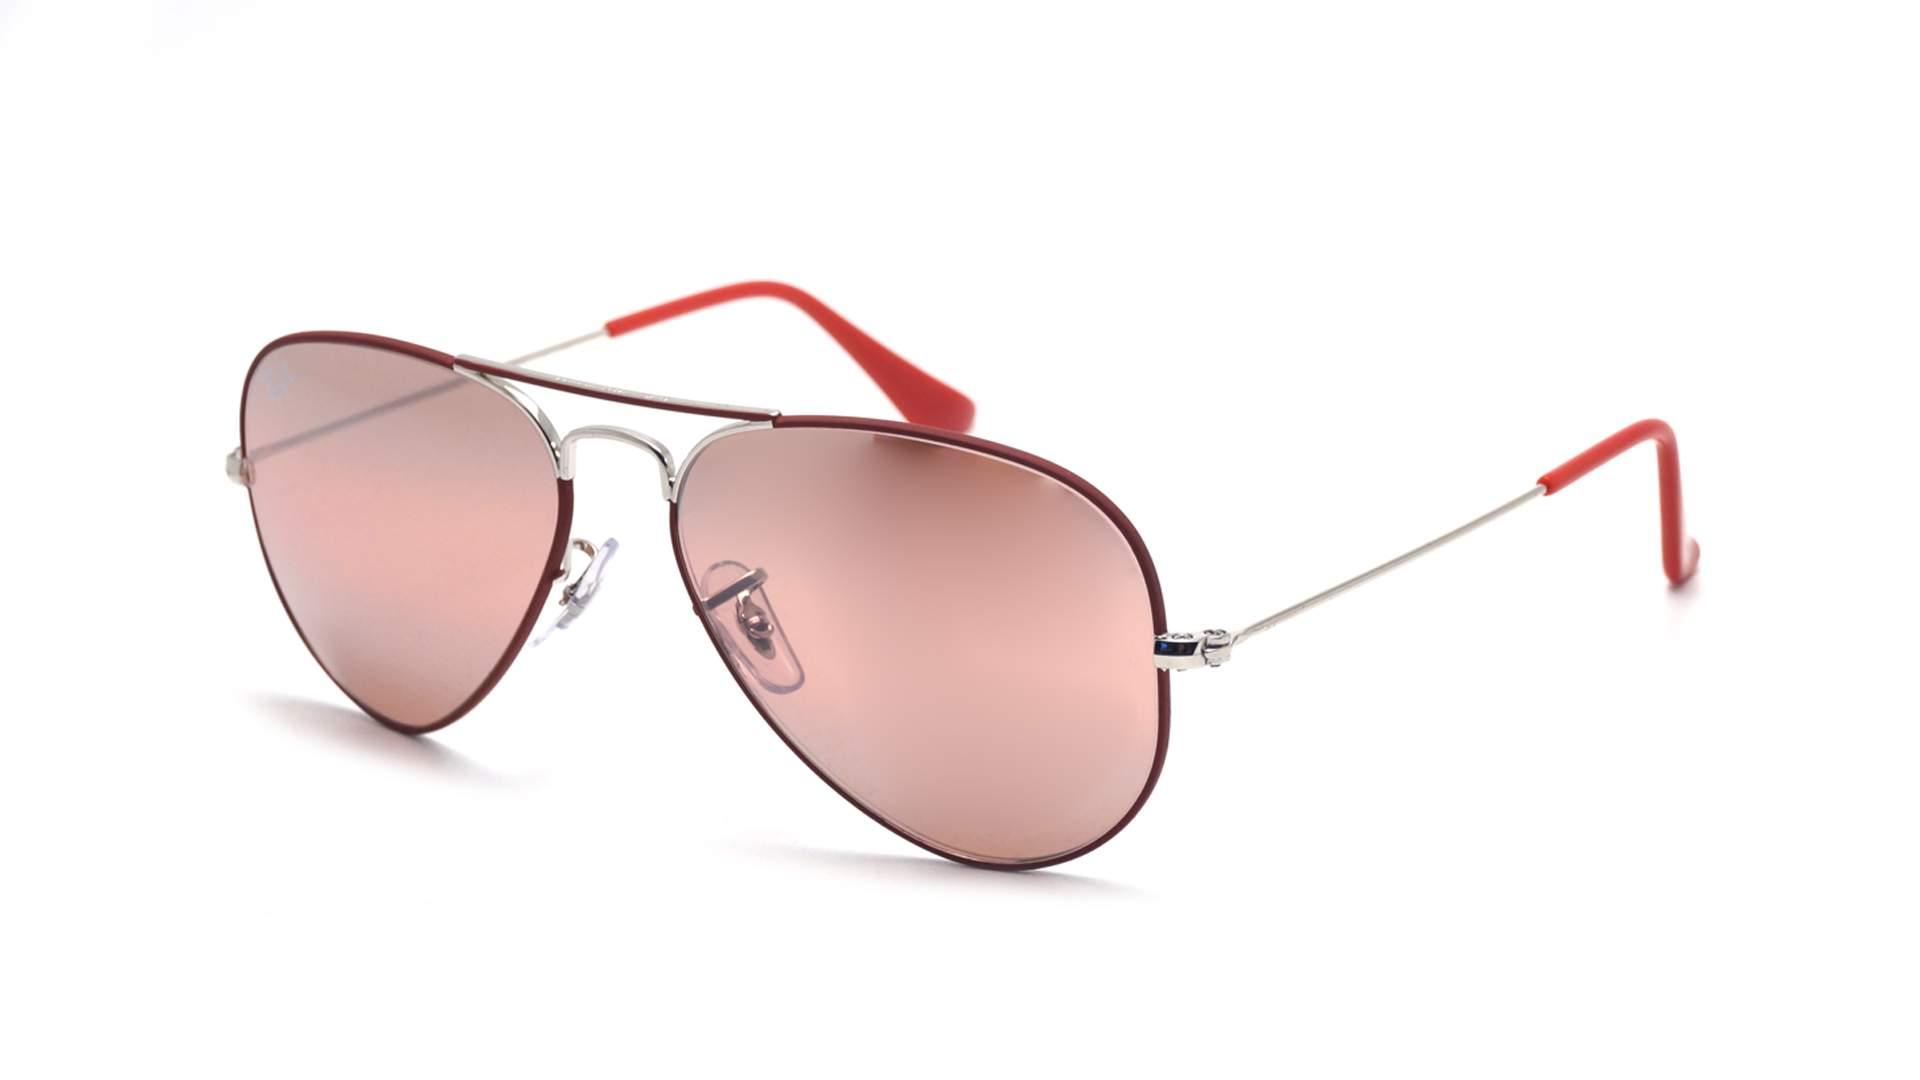 bf0f8a3e0a93f Sunglasses Ray-Ban Aviator Mirror Silver Mat RB3025 9155 AI 55-14 Small  Photochromic Gradient Flash